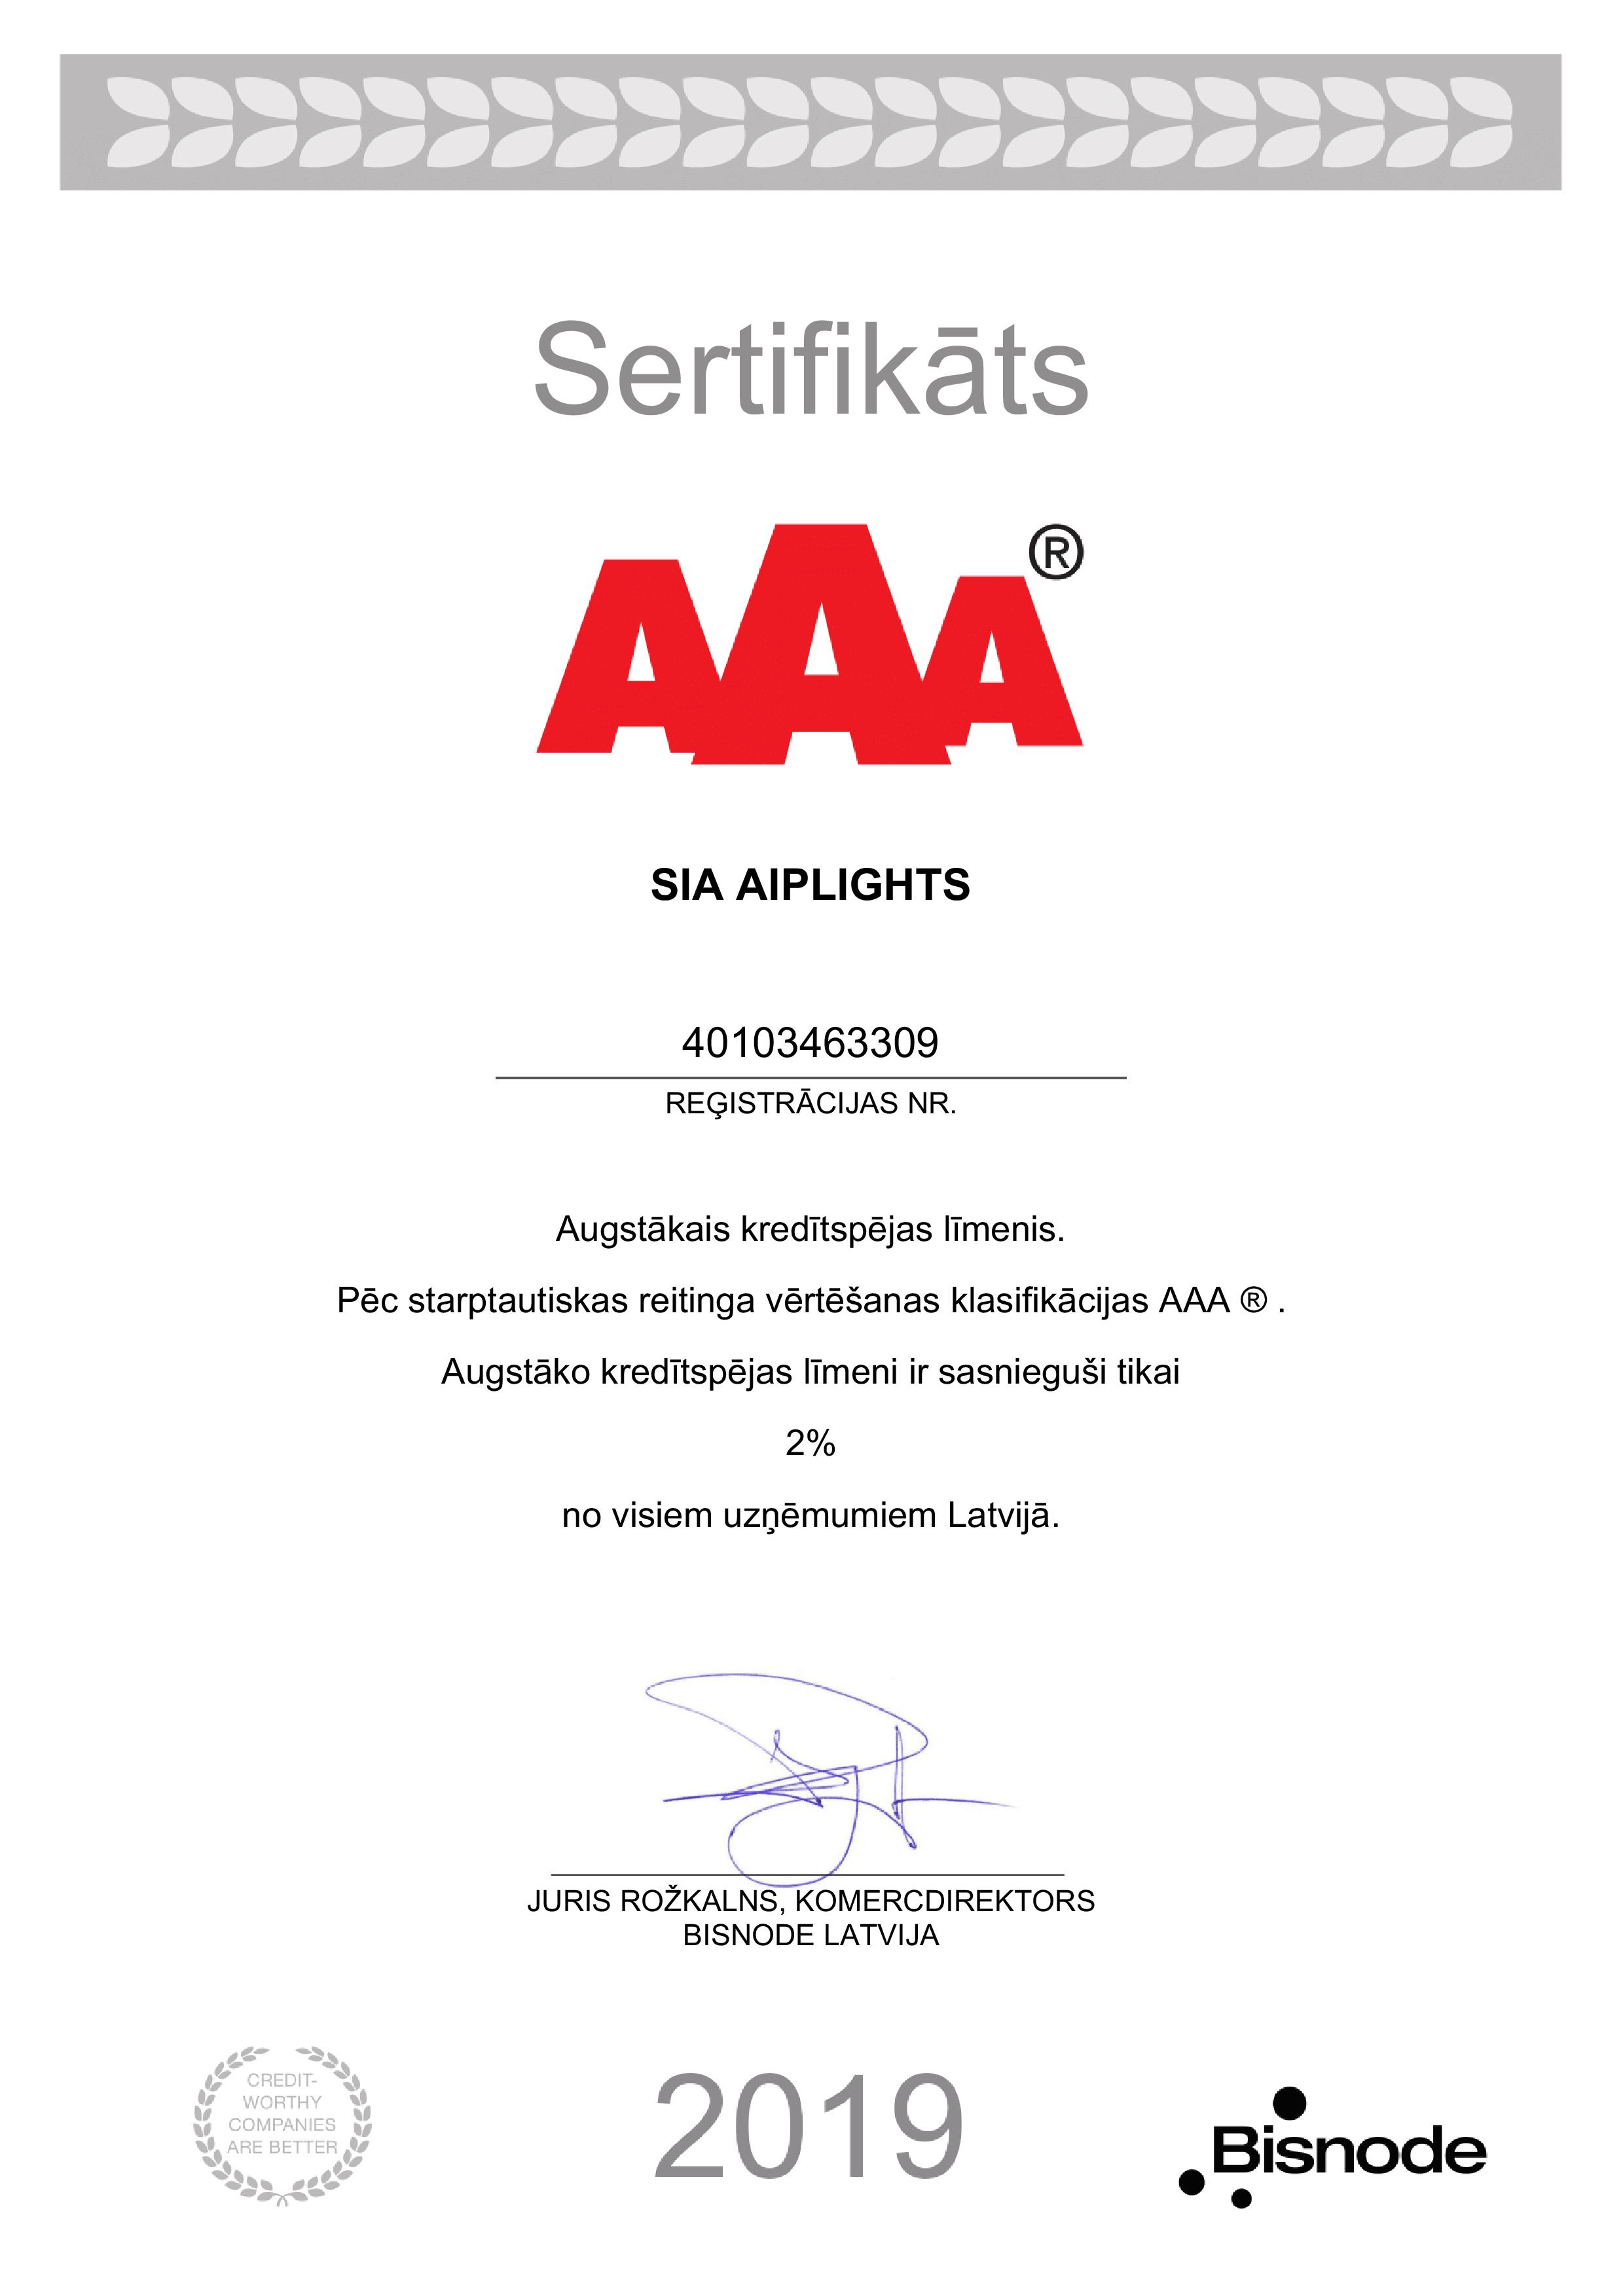 sertifikats_ LV_AIPLIGHTS-PNG